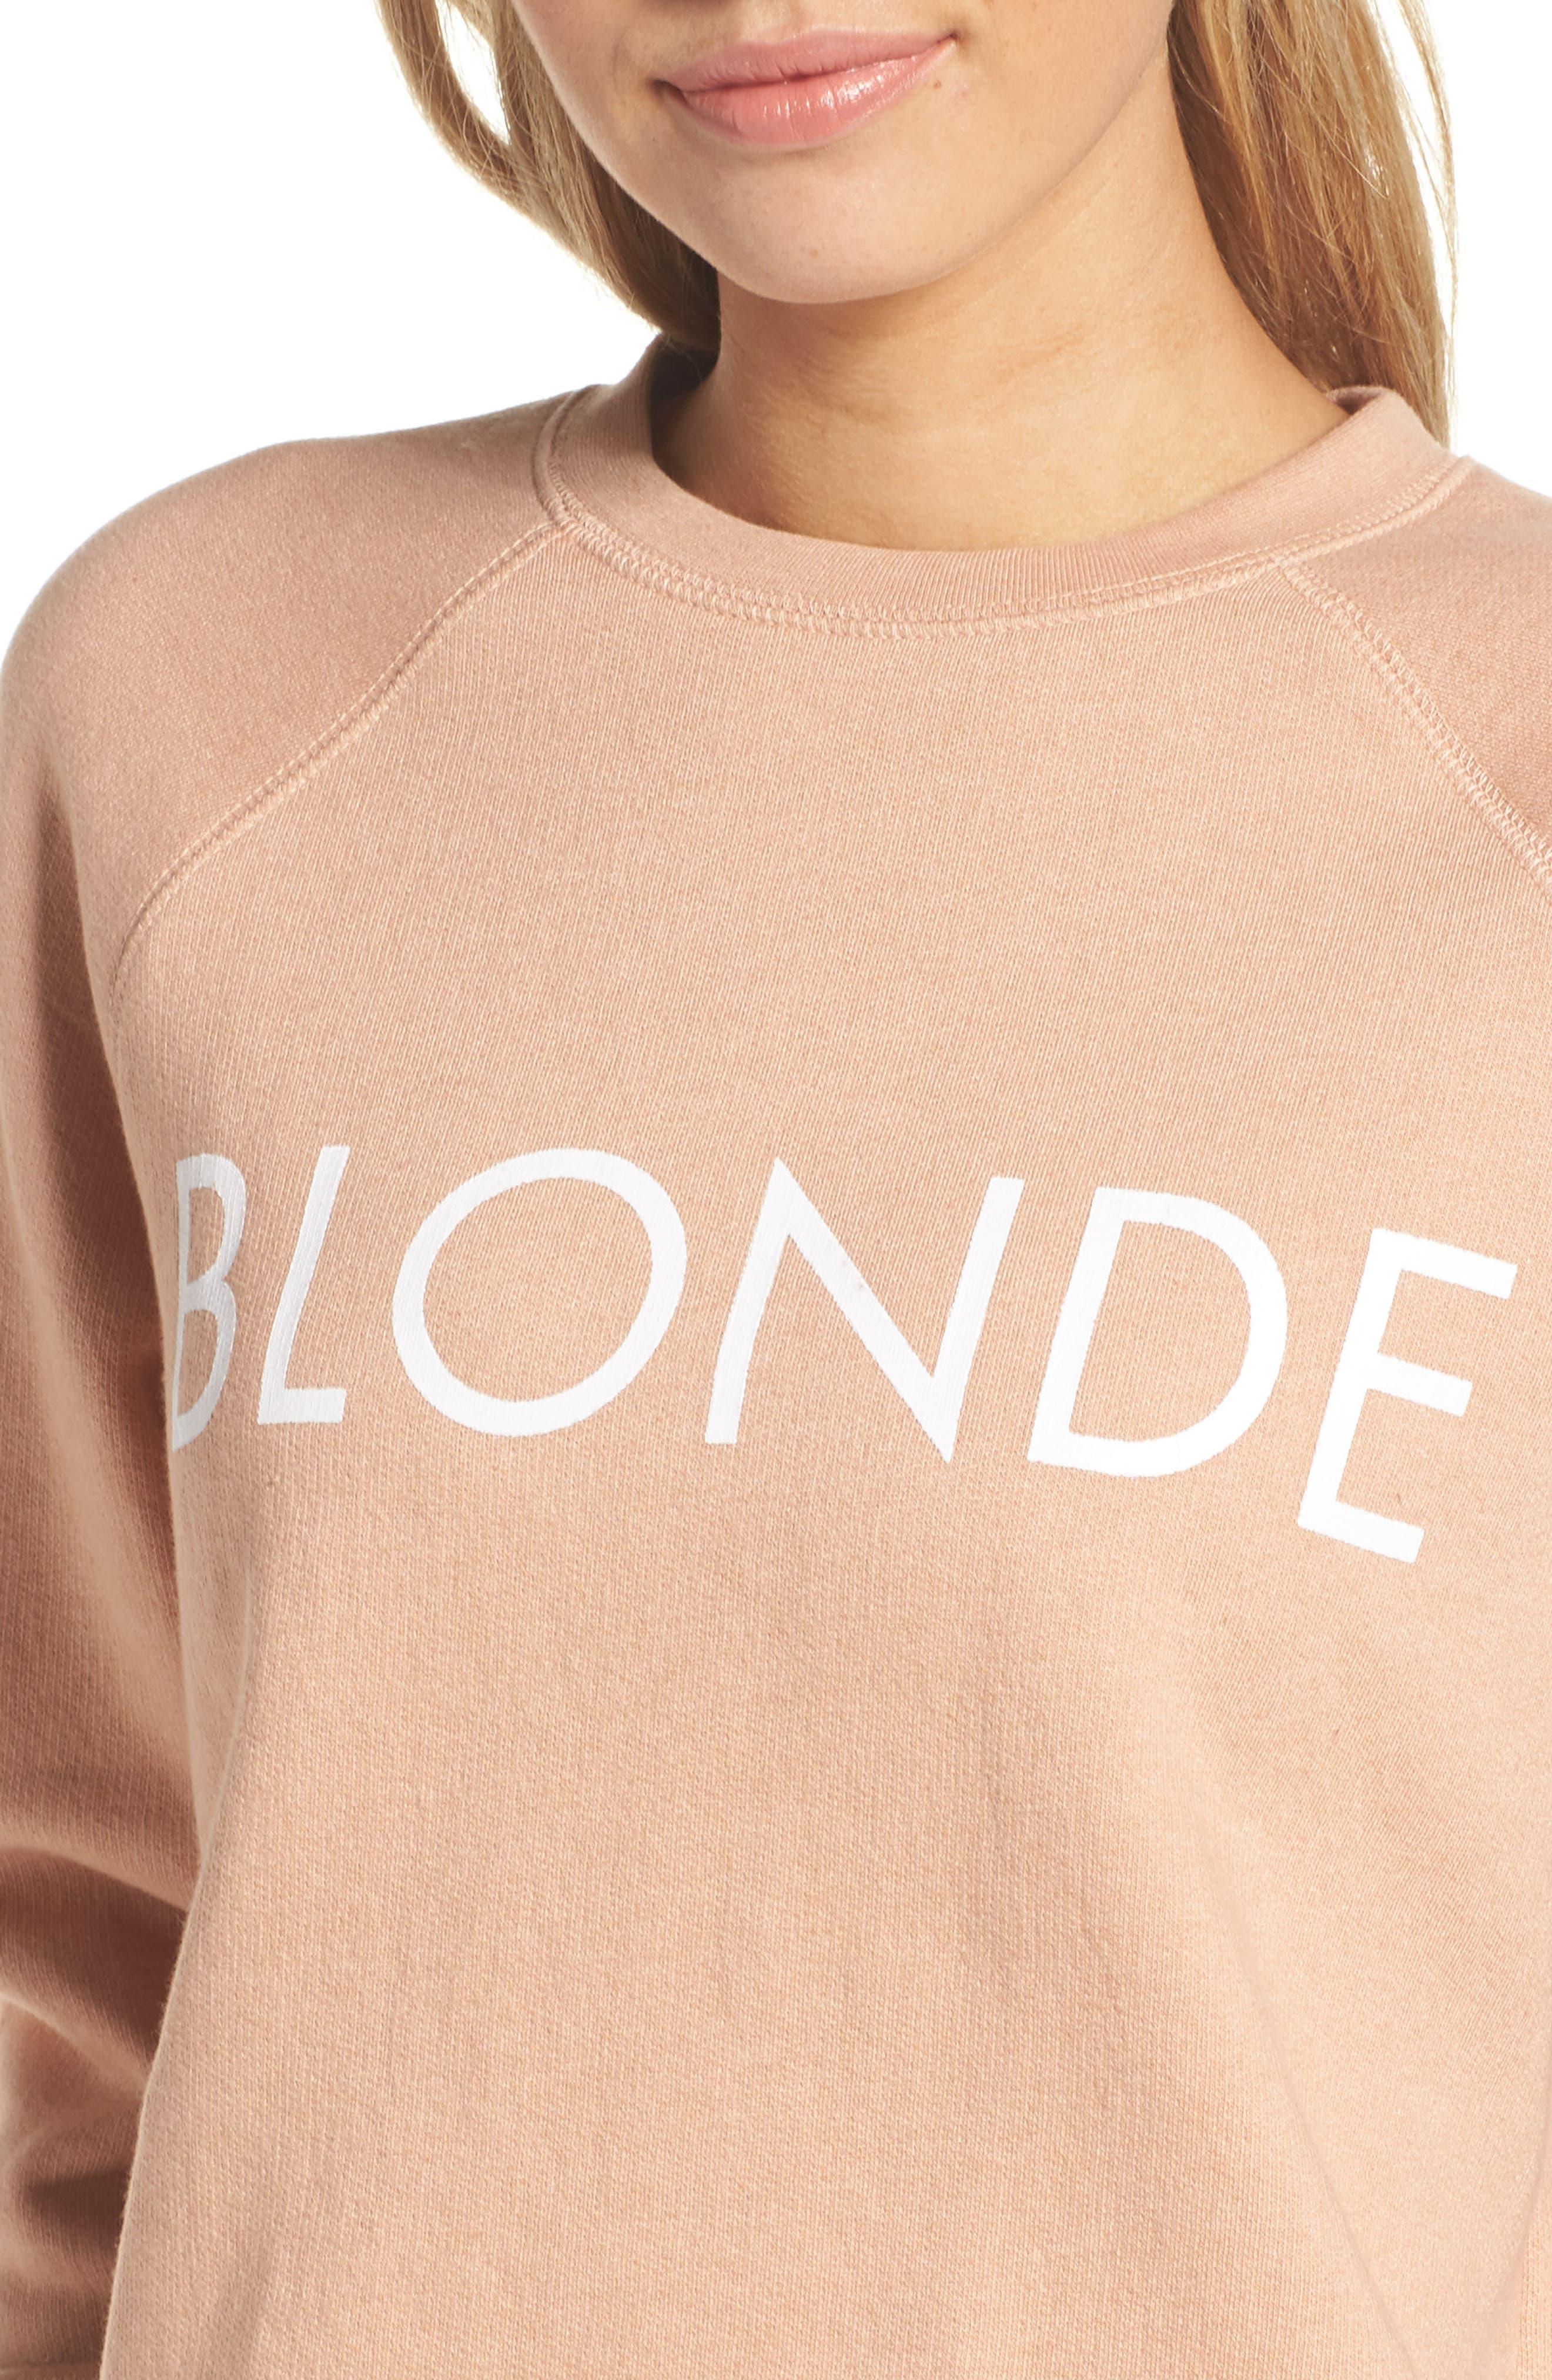 Middle Sister Blonde Sweatshirt,                             Alternate thumbnail 6, color,                             Beige